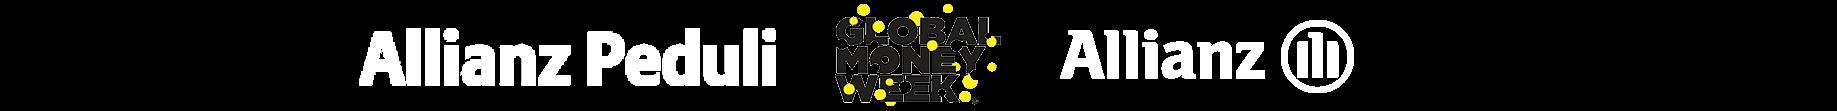 Allianz Peduli, Global Money Week, Allianz